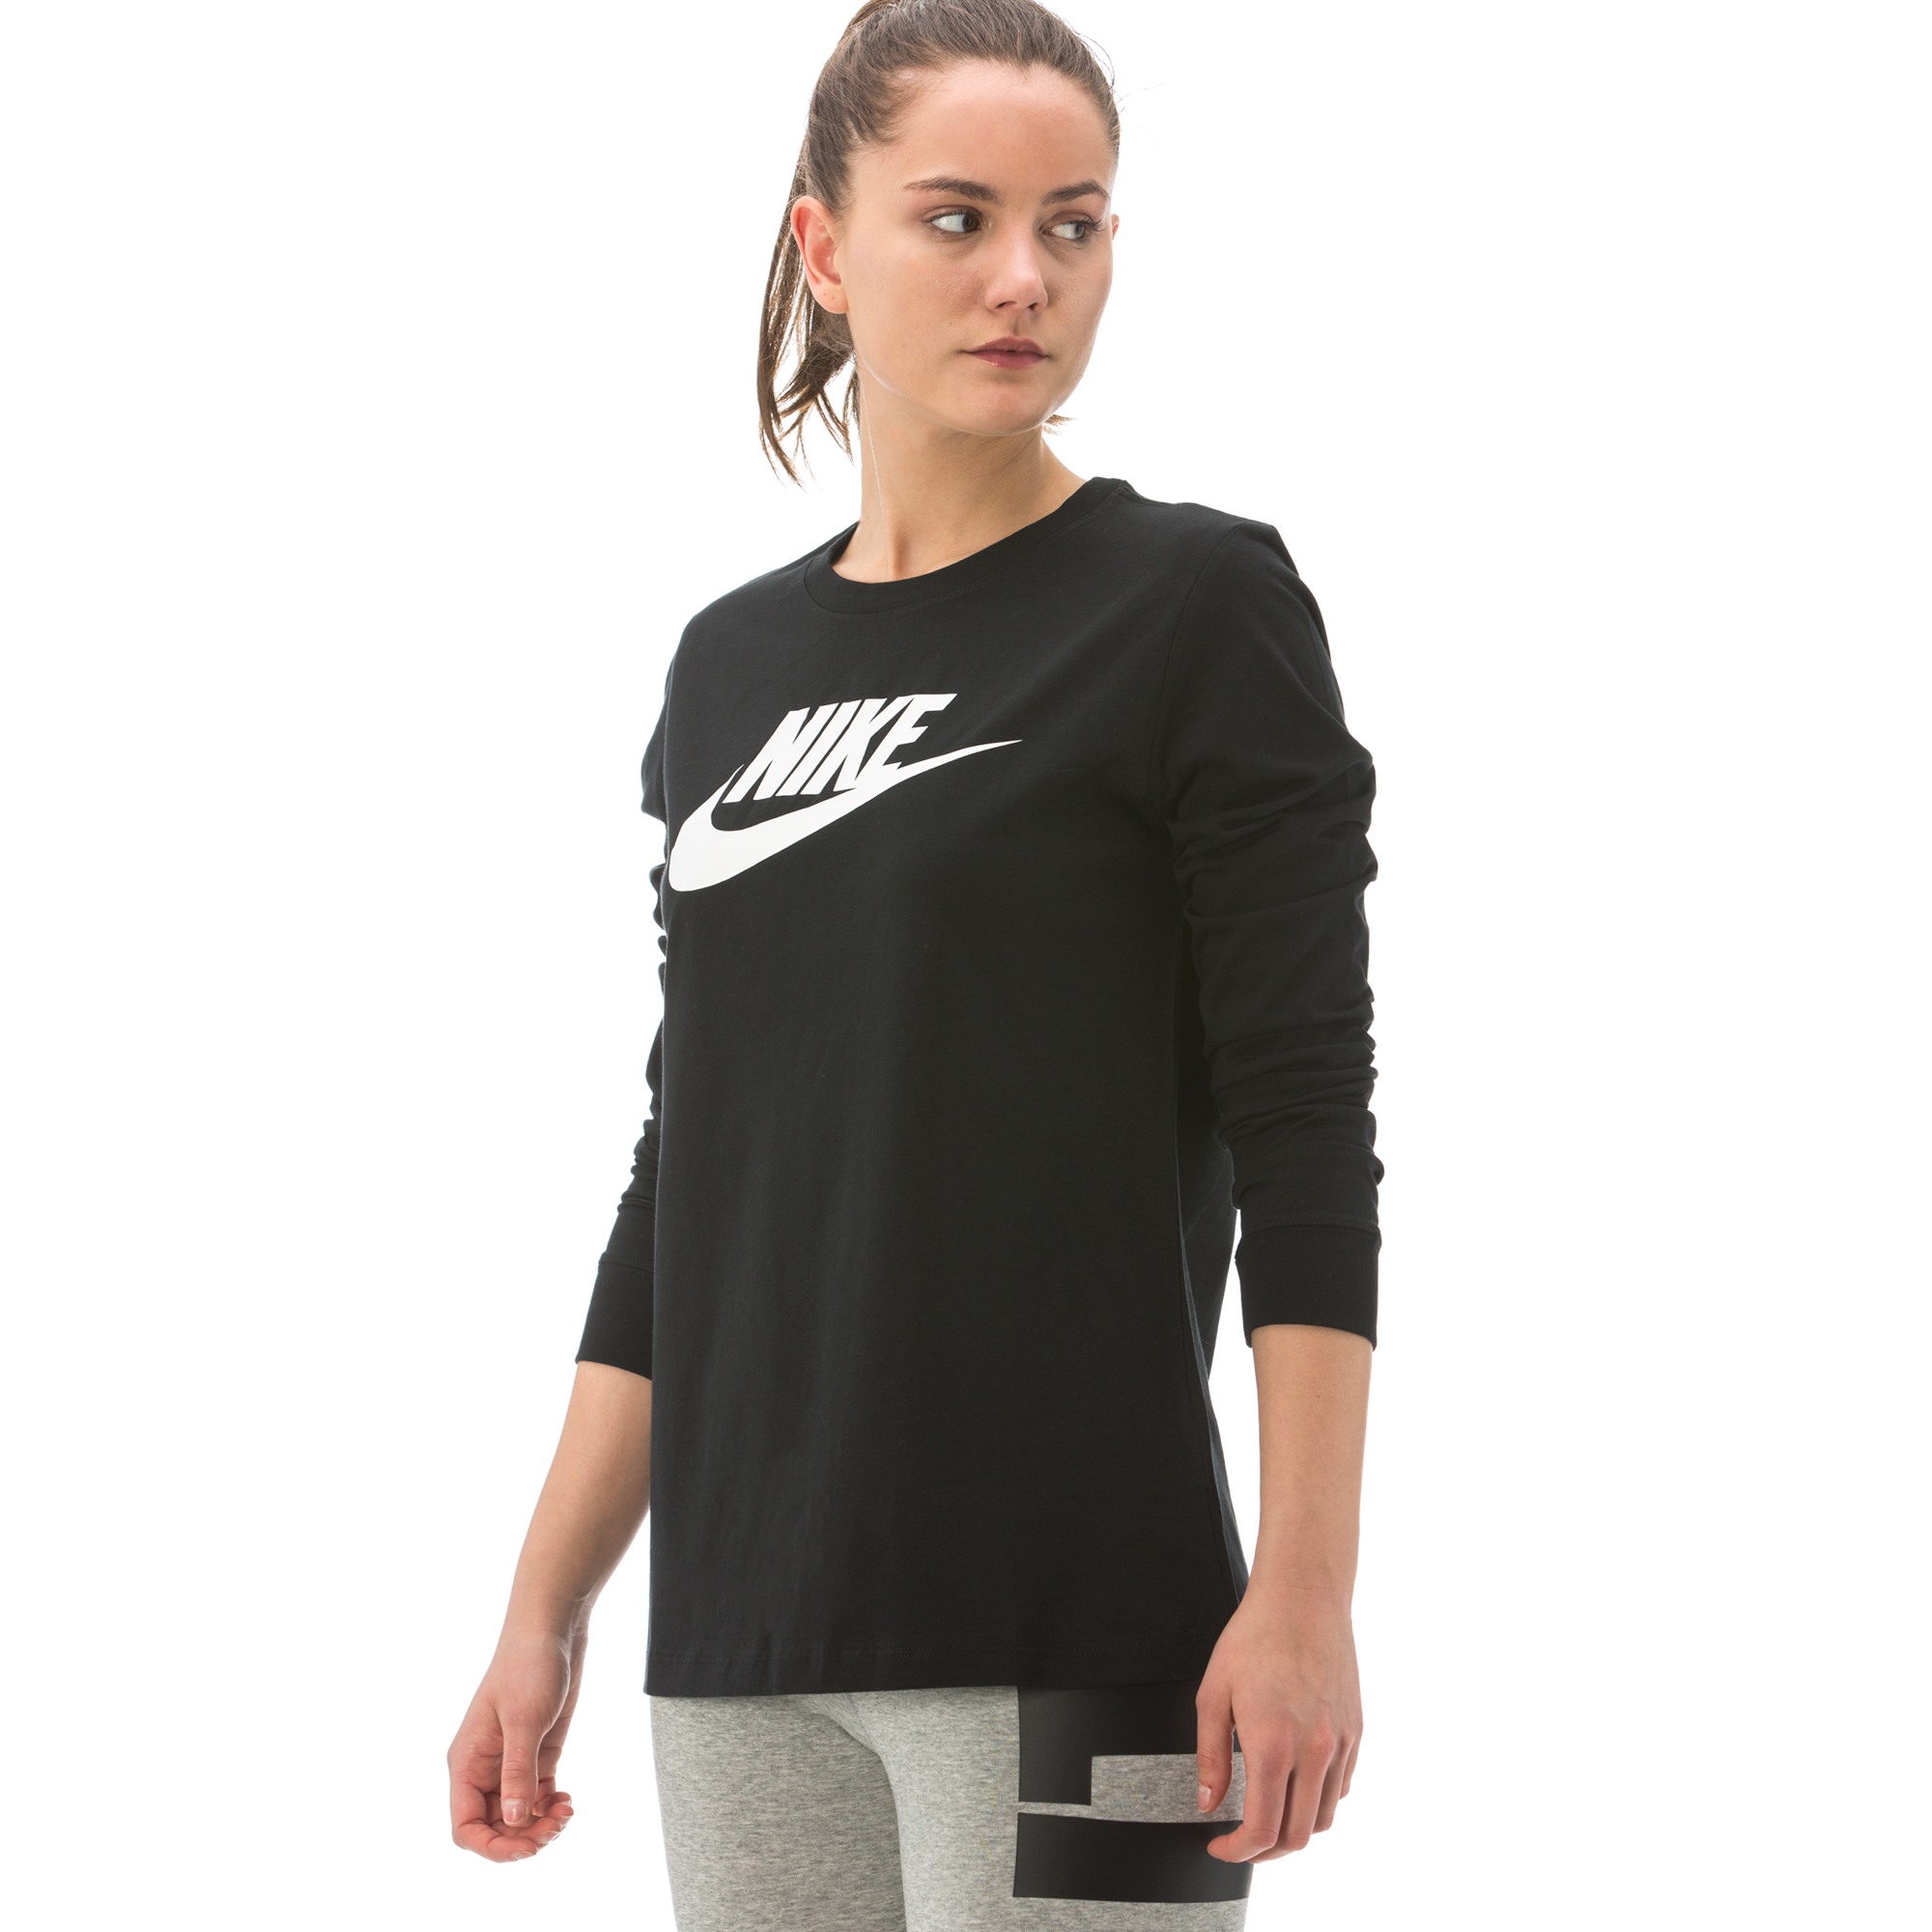 Nike Essential Kadın Siyah T-Shirt